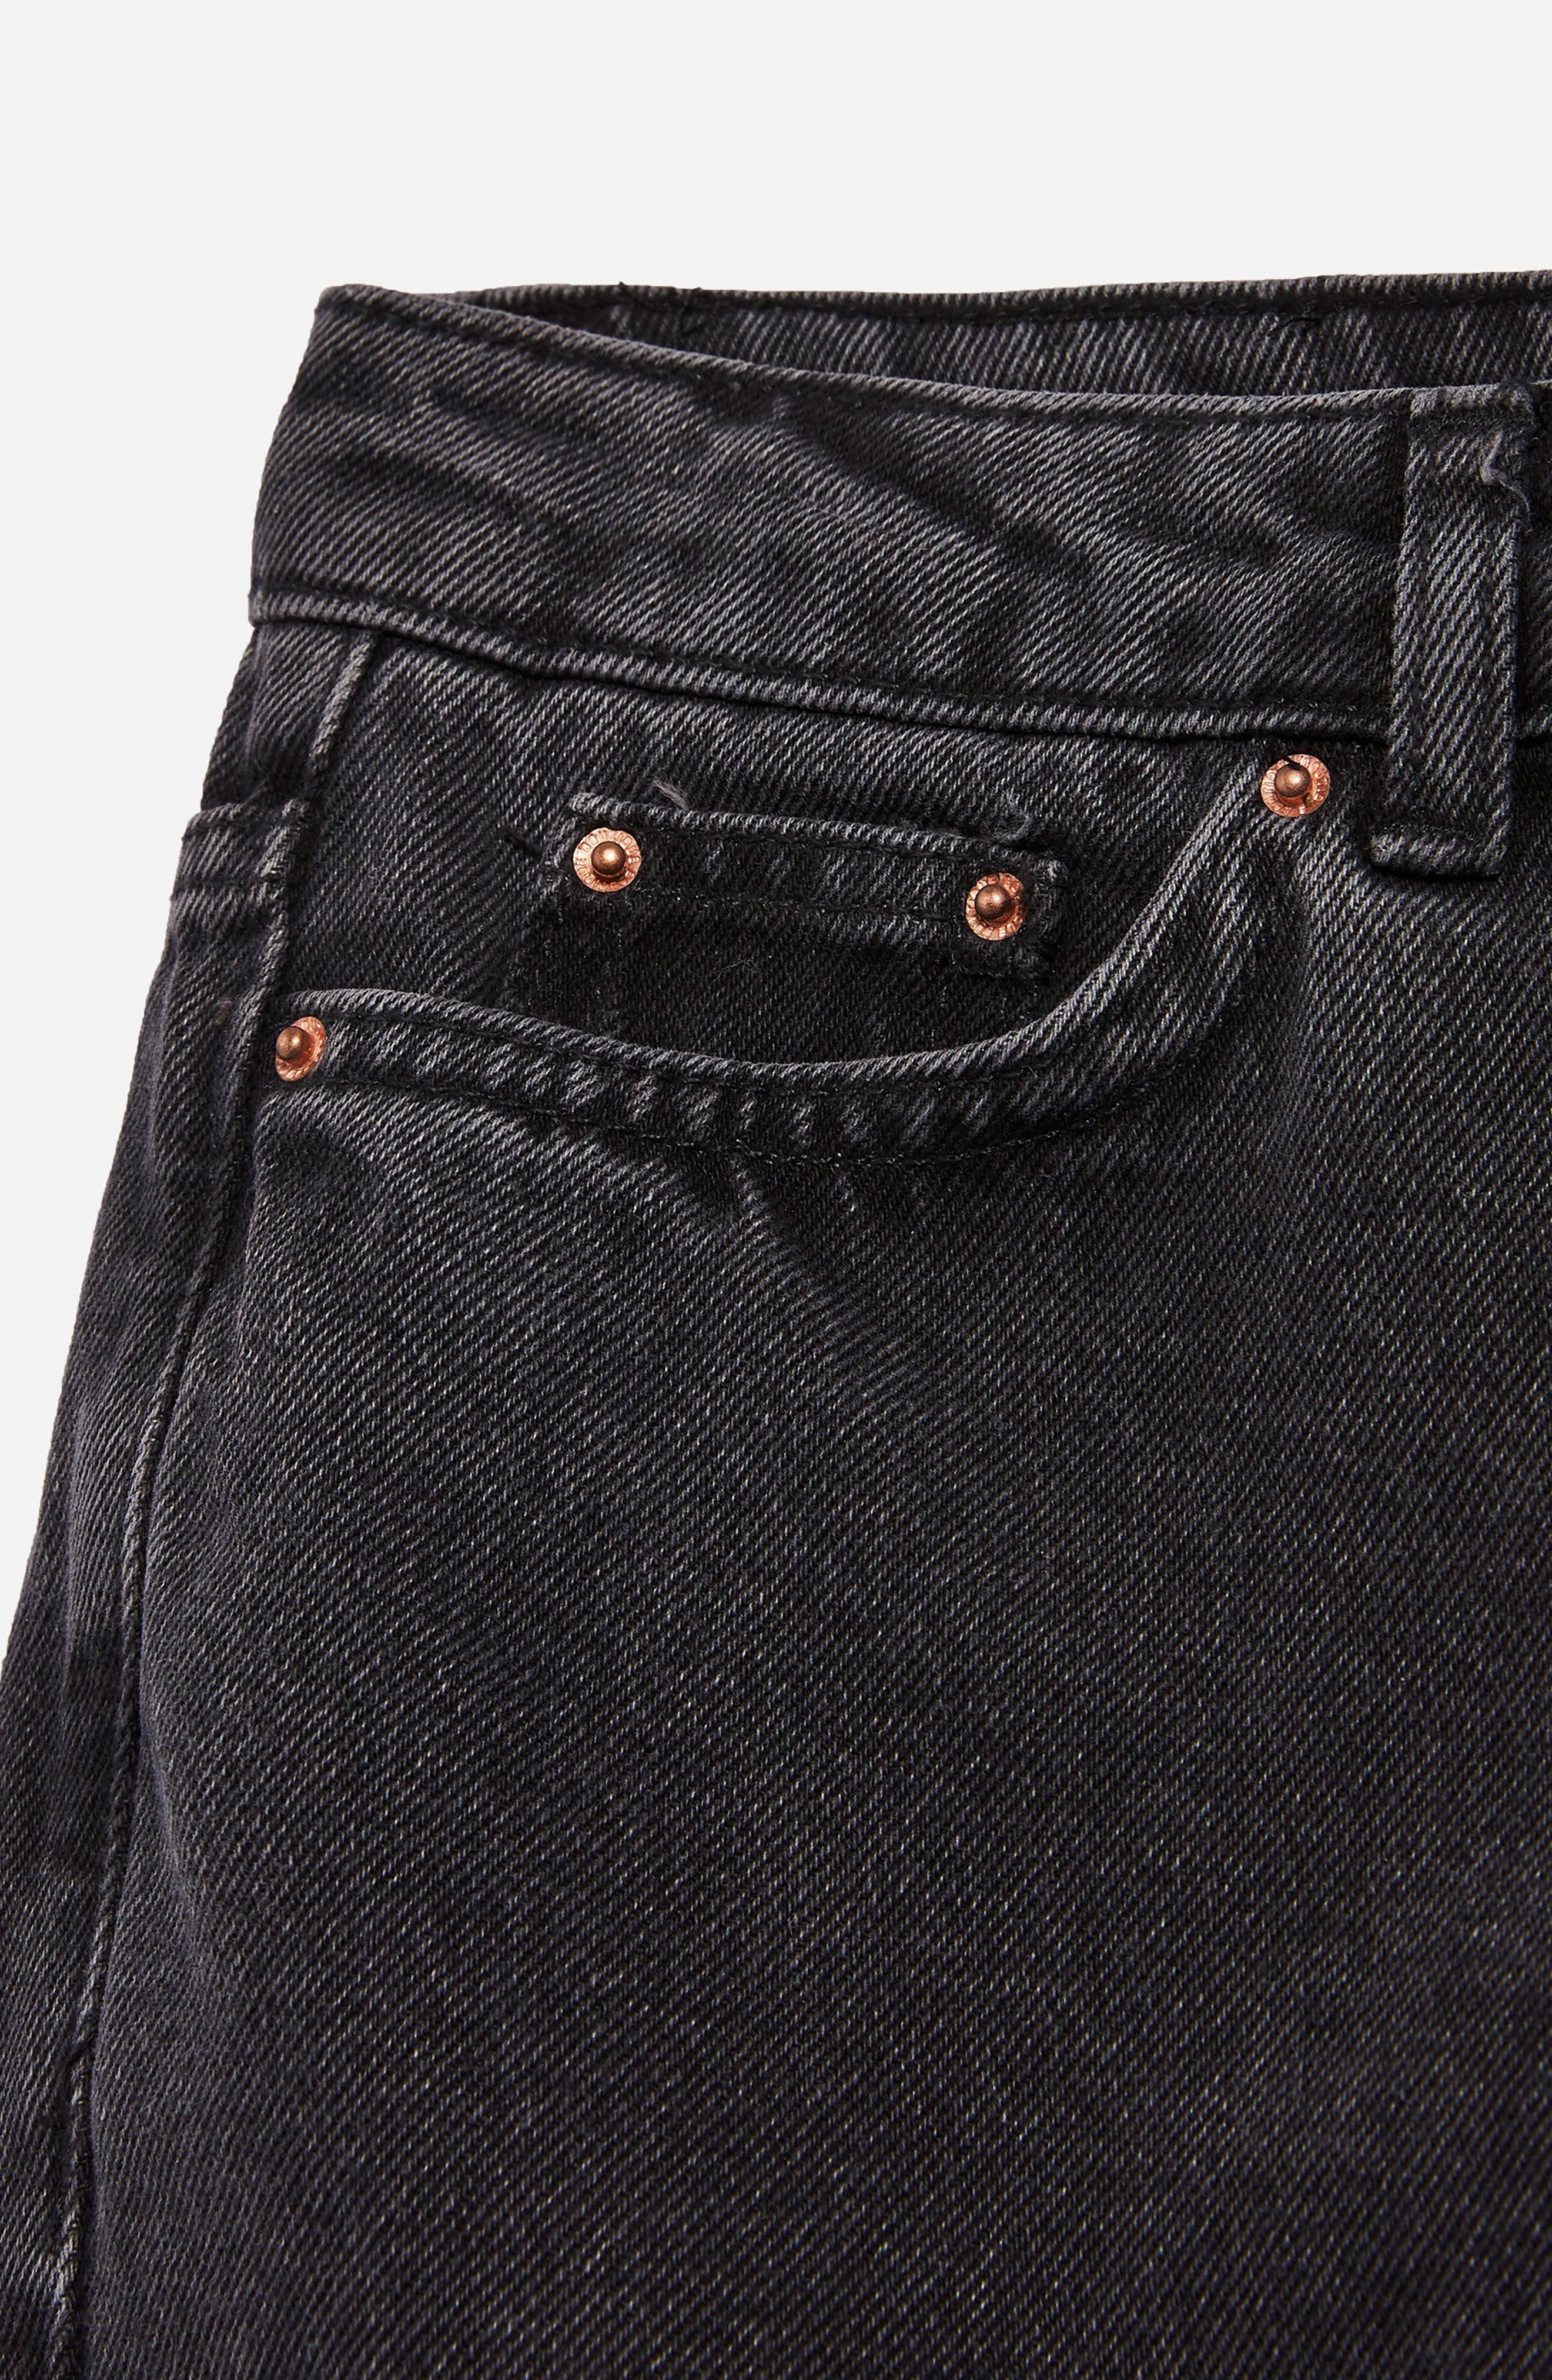 Alternate Image 3  - Topshop Boutique Raw Hem Kick Flare Jeans